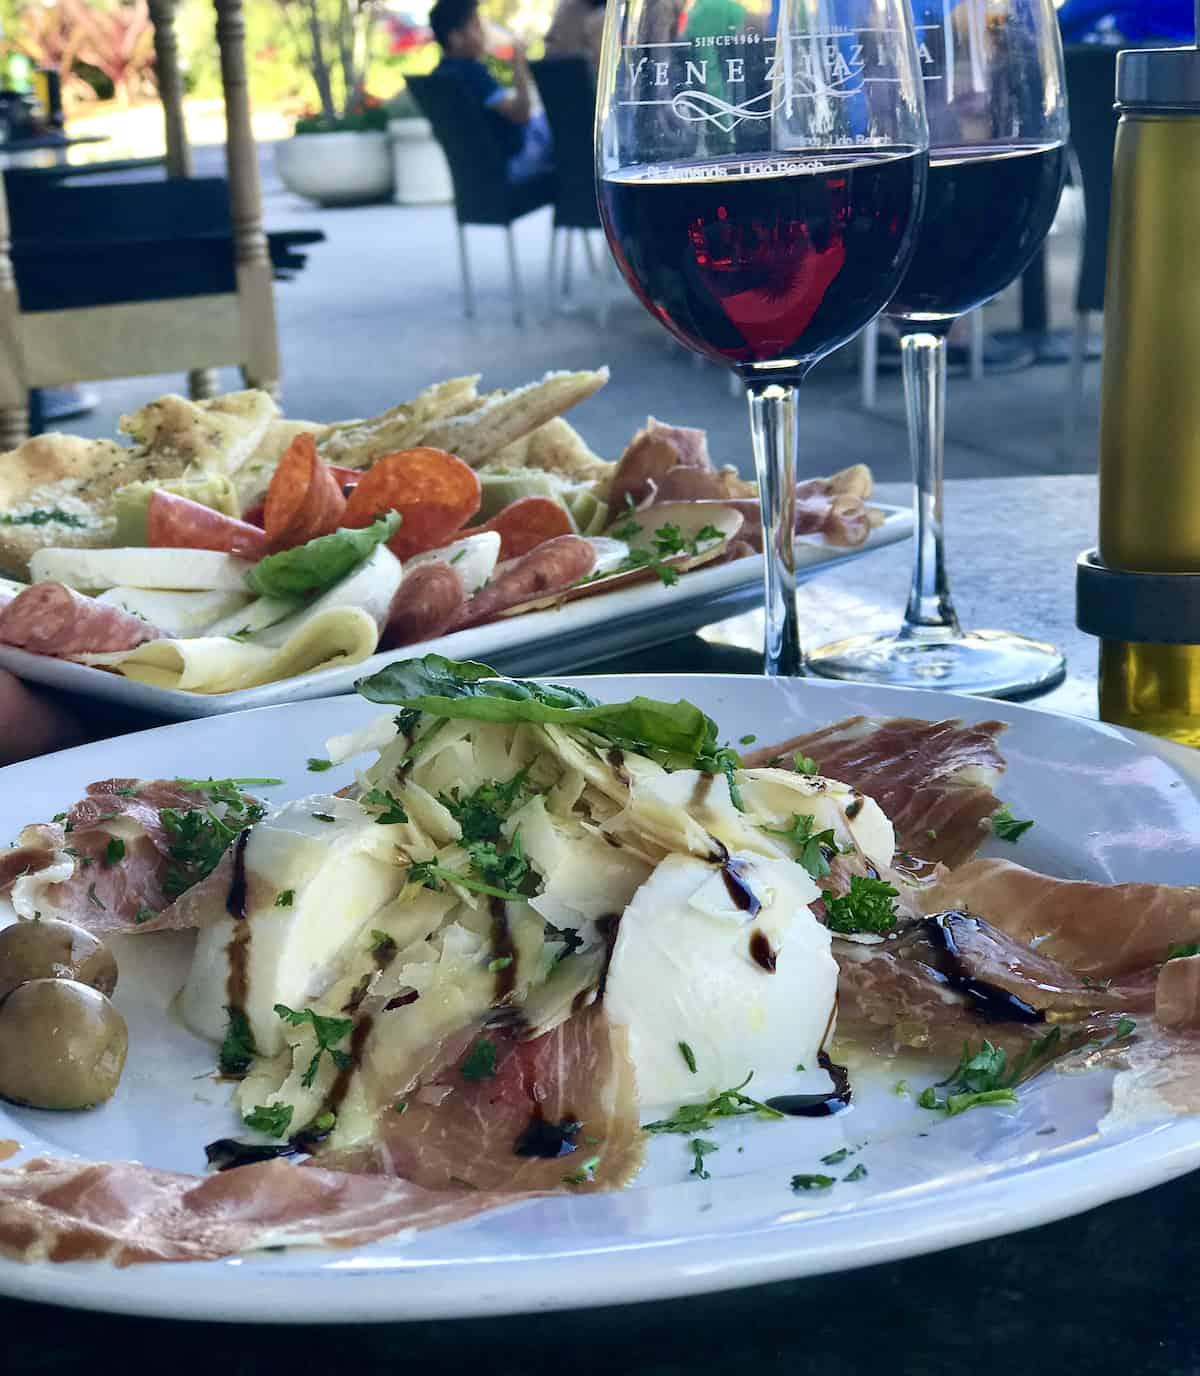 Italian appetizers at Venezio restaurant.